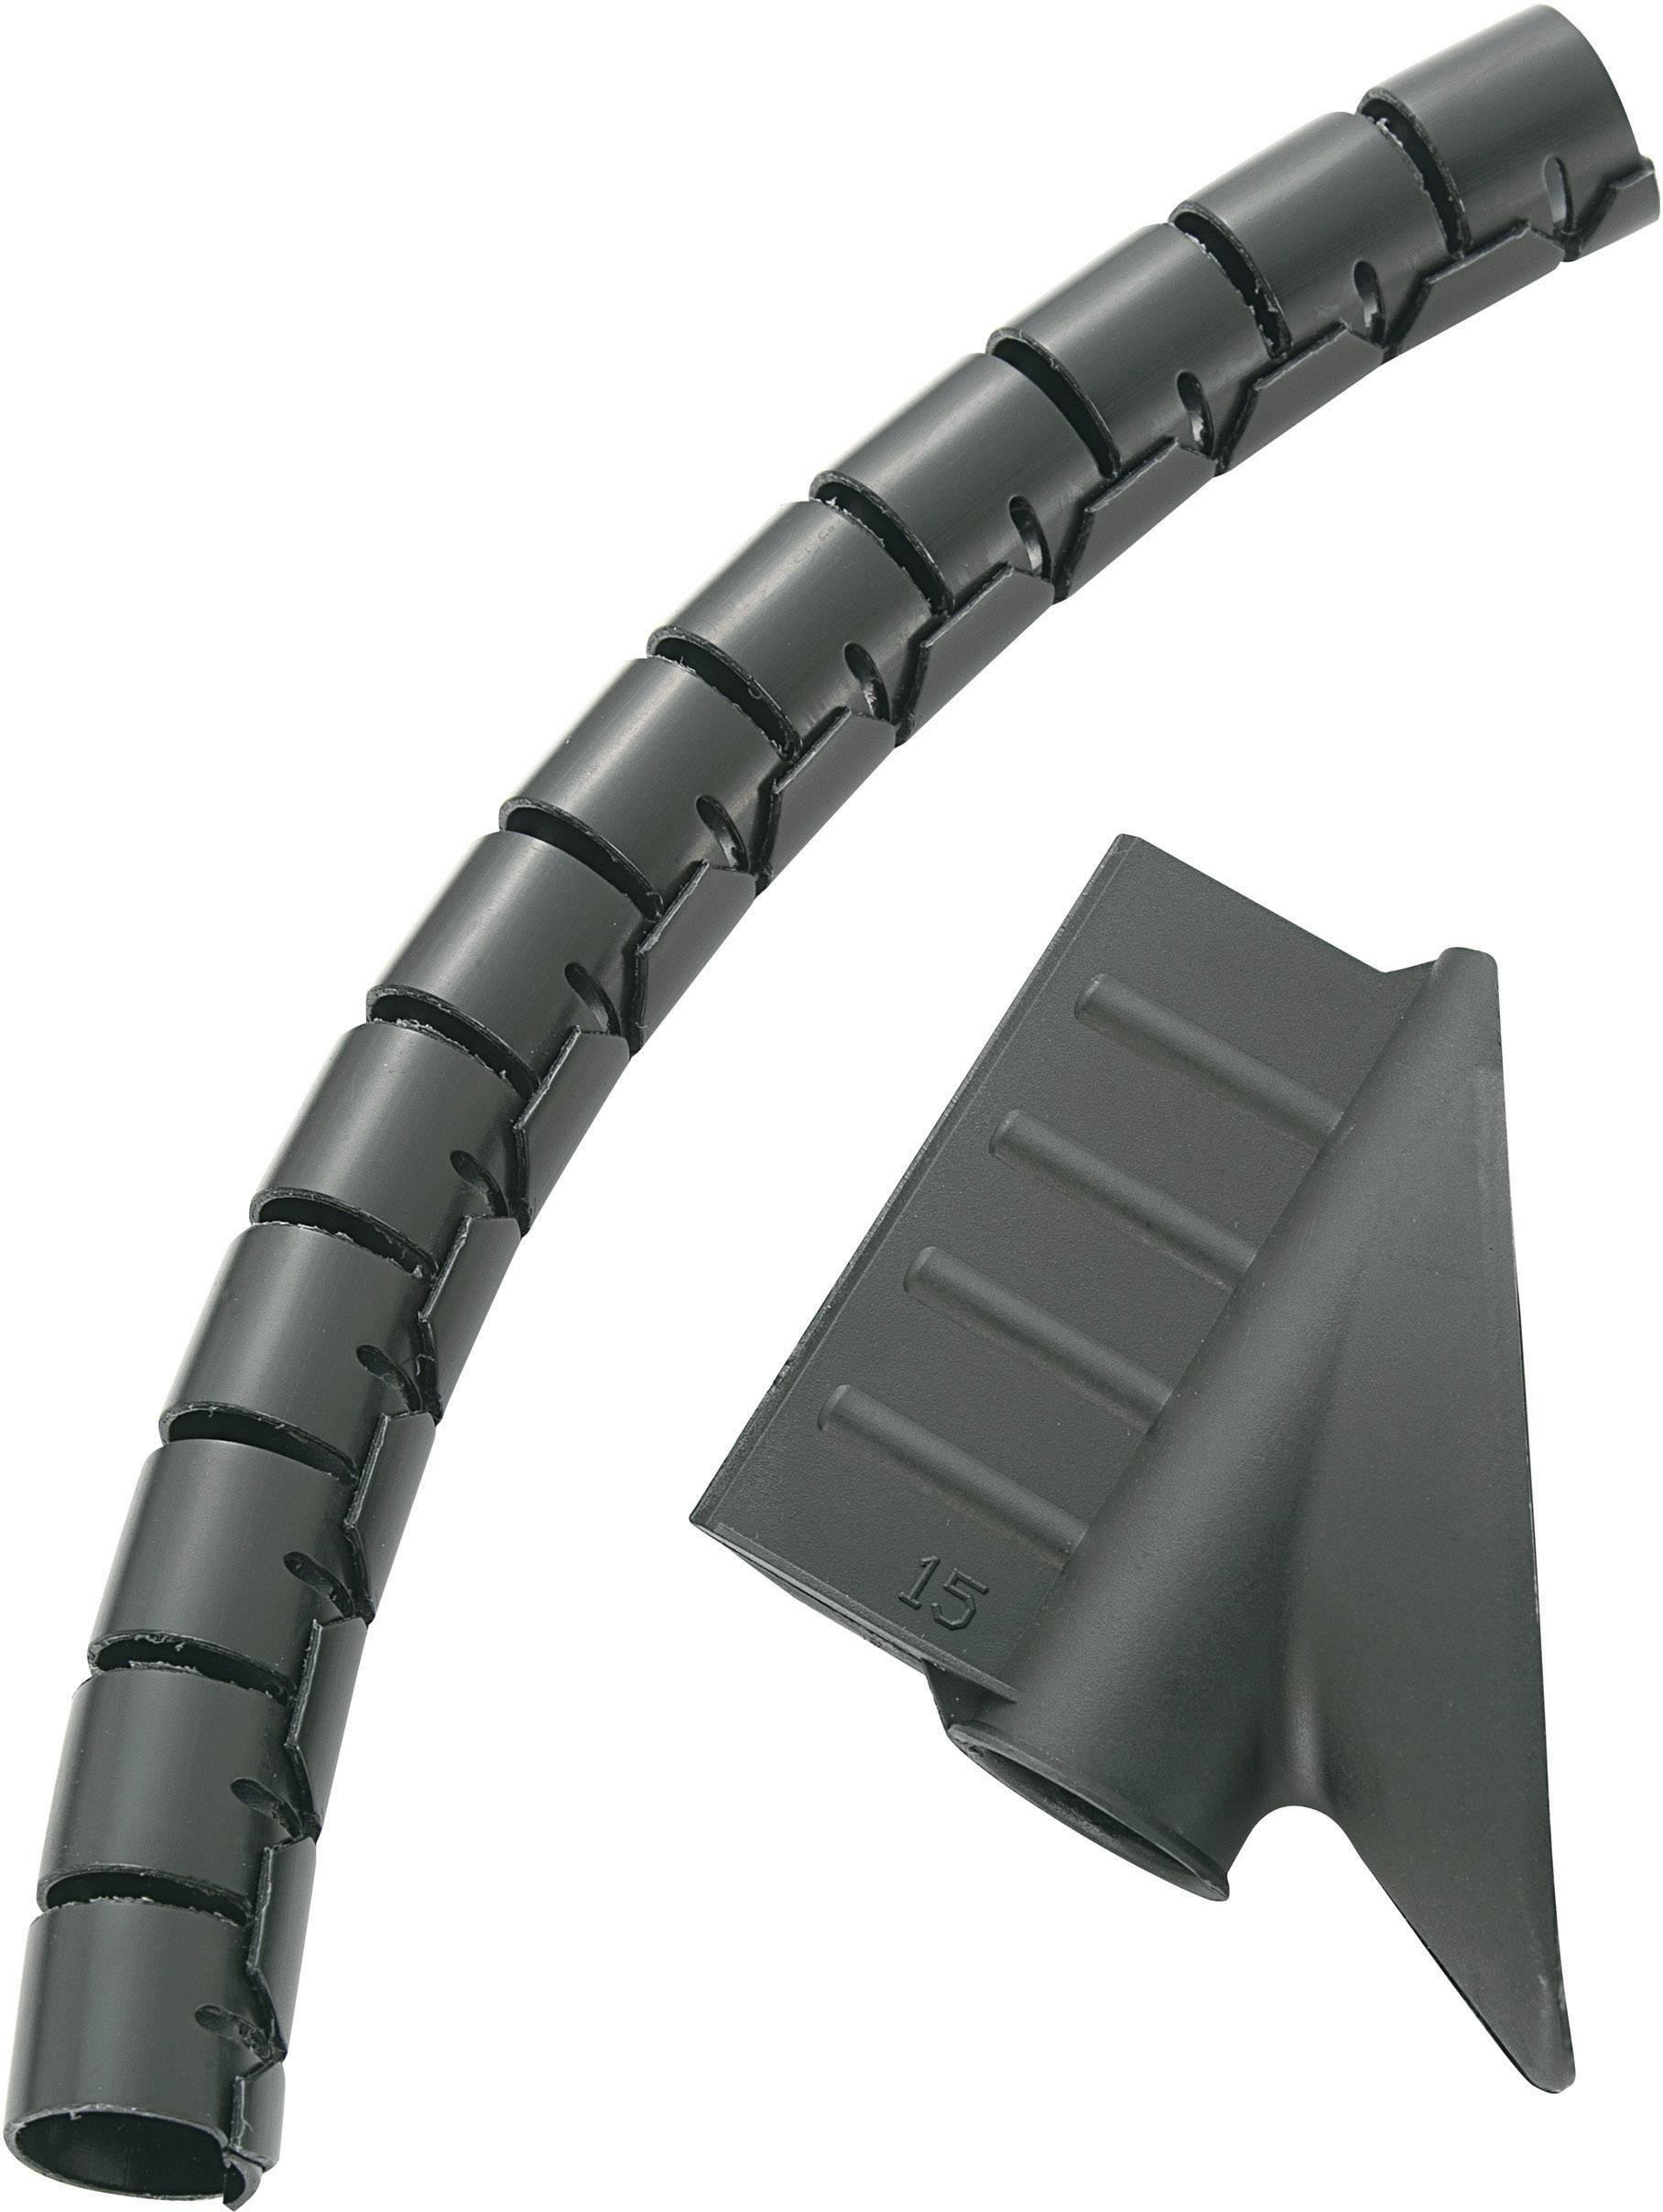 Káblový oplet KSS MX-KLT15SL, 15 mm (max), 5 m, strieborná